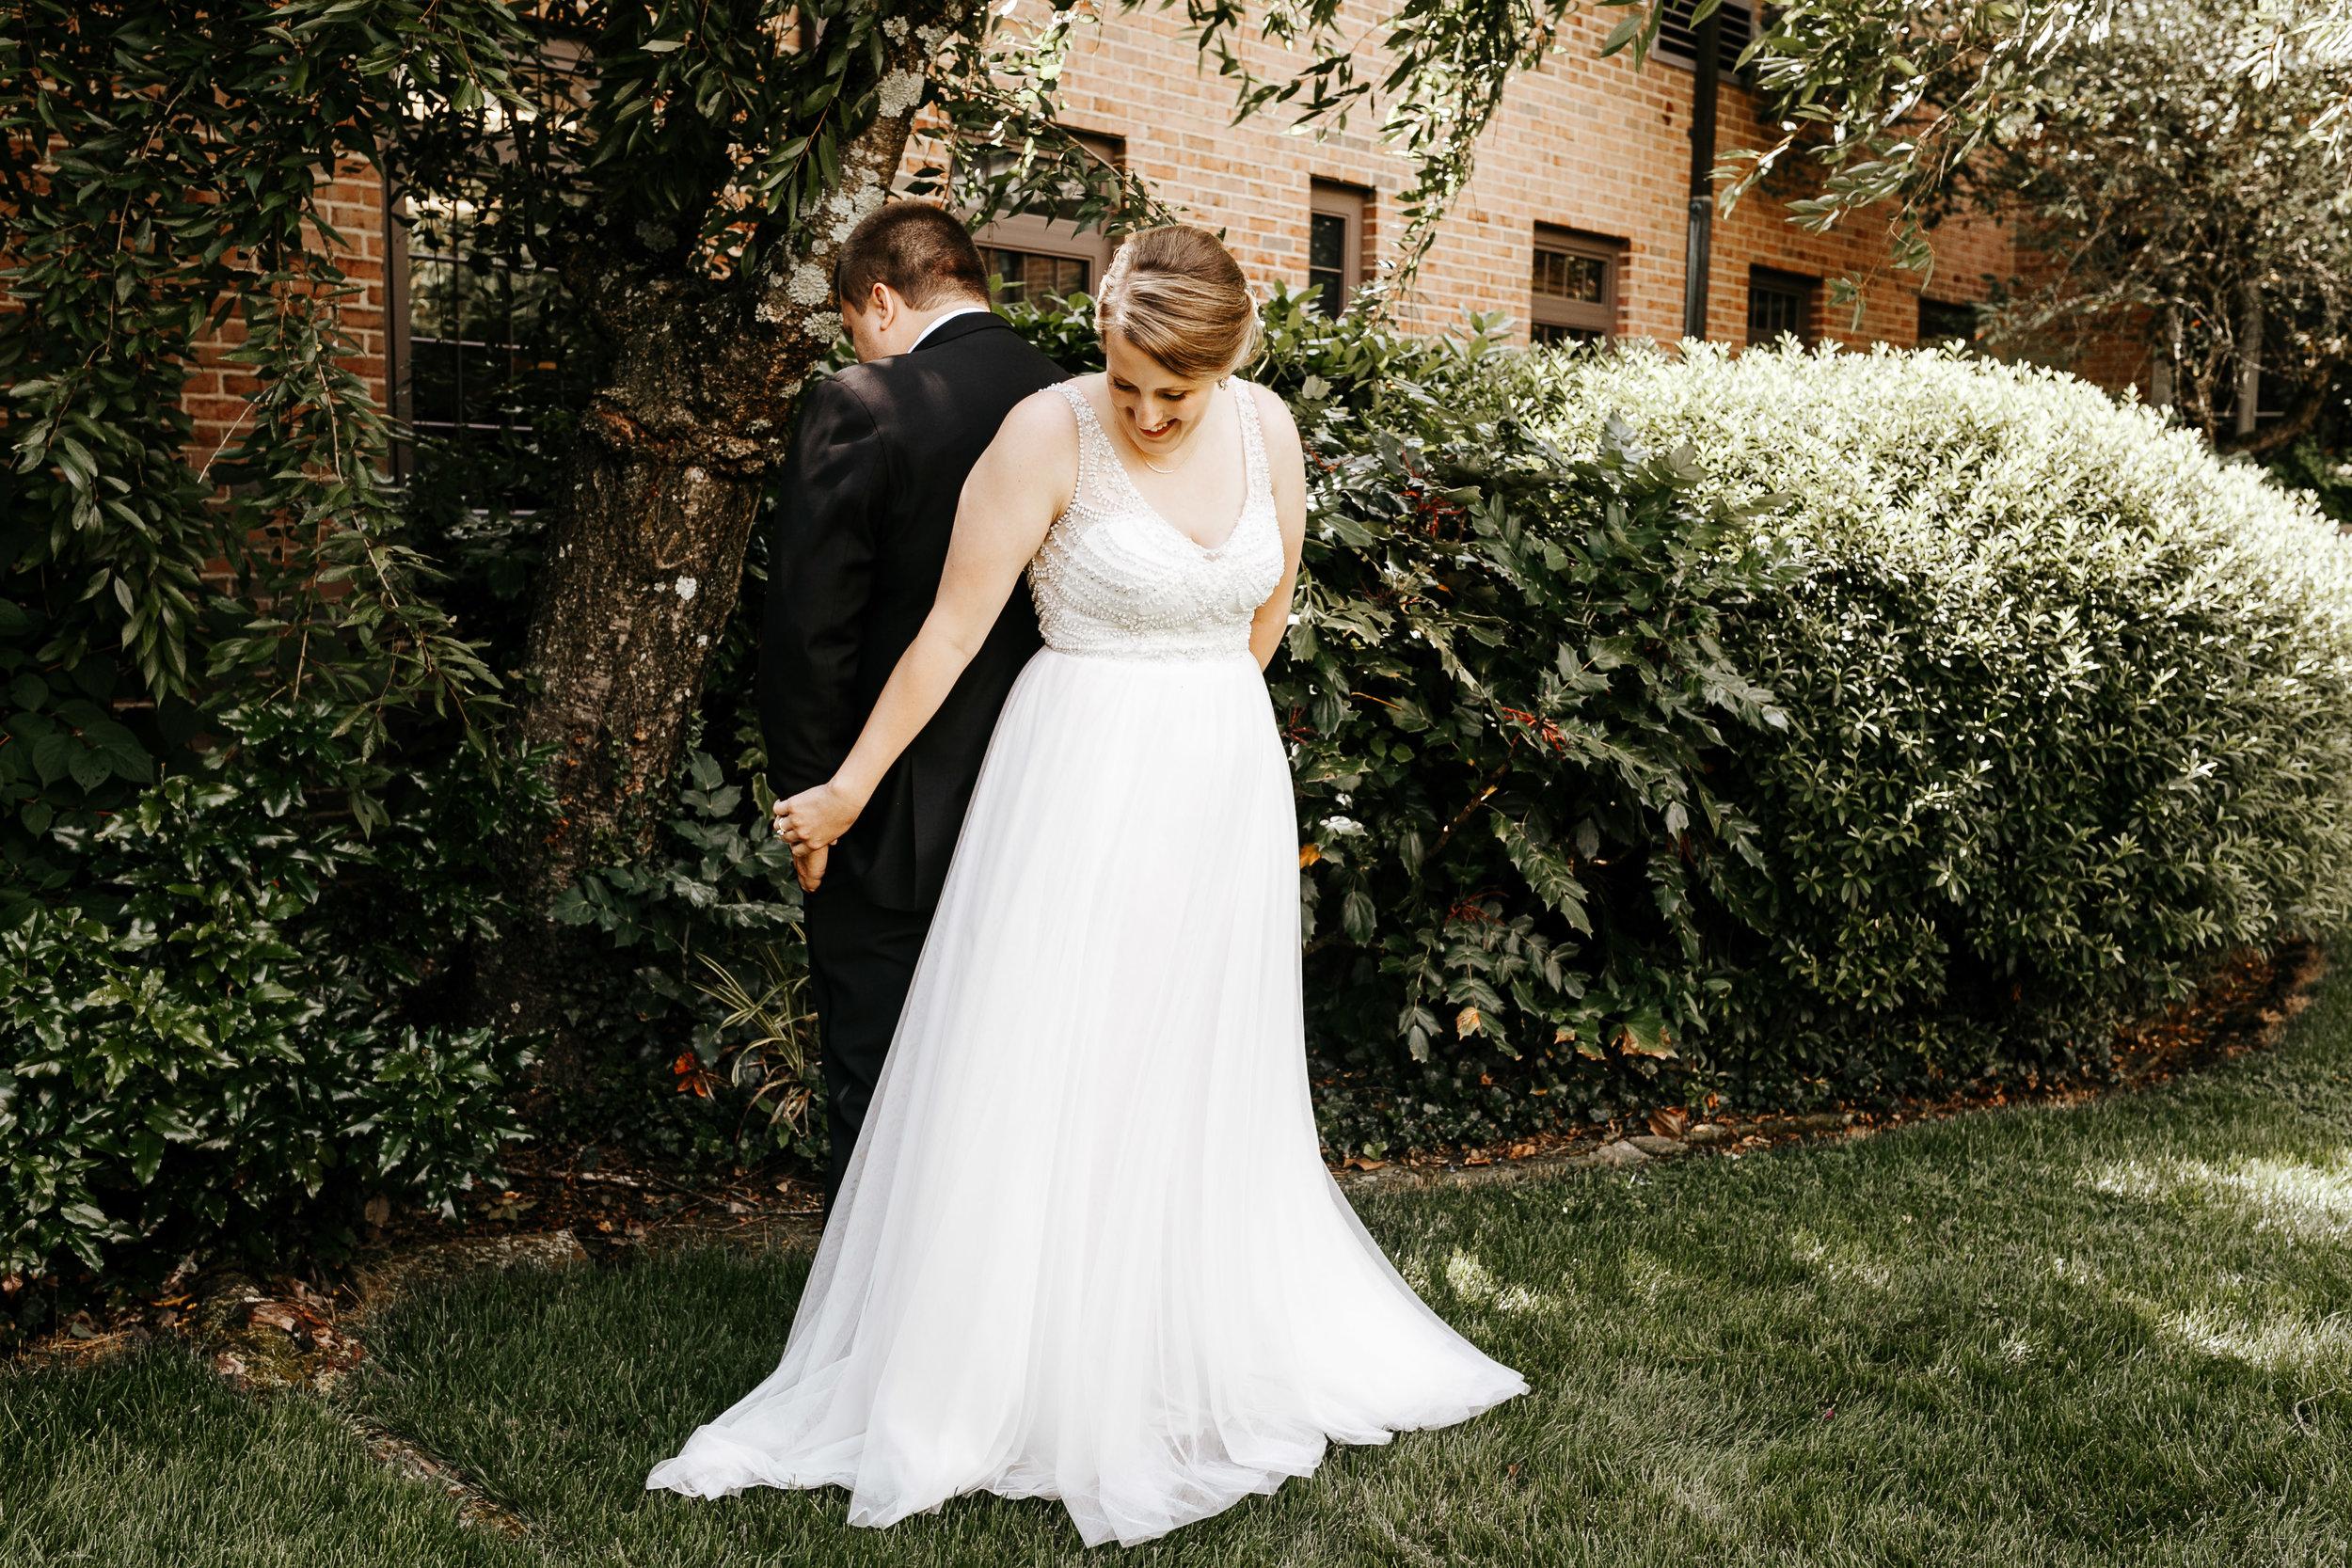 bohemian-photographer-wedding-tennessee-29.jpg